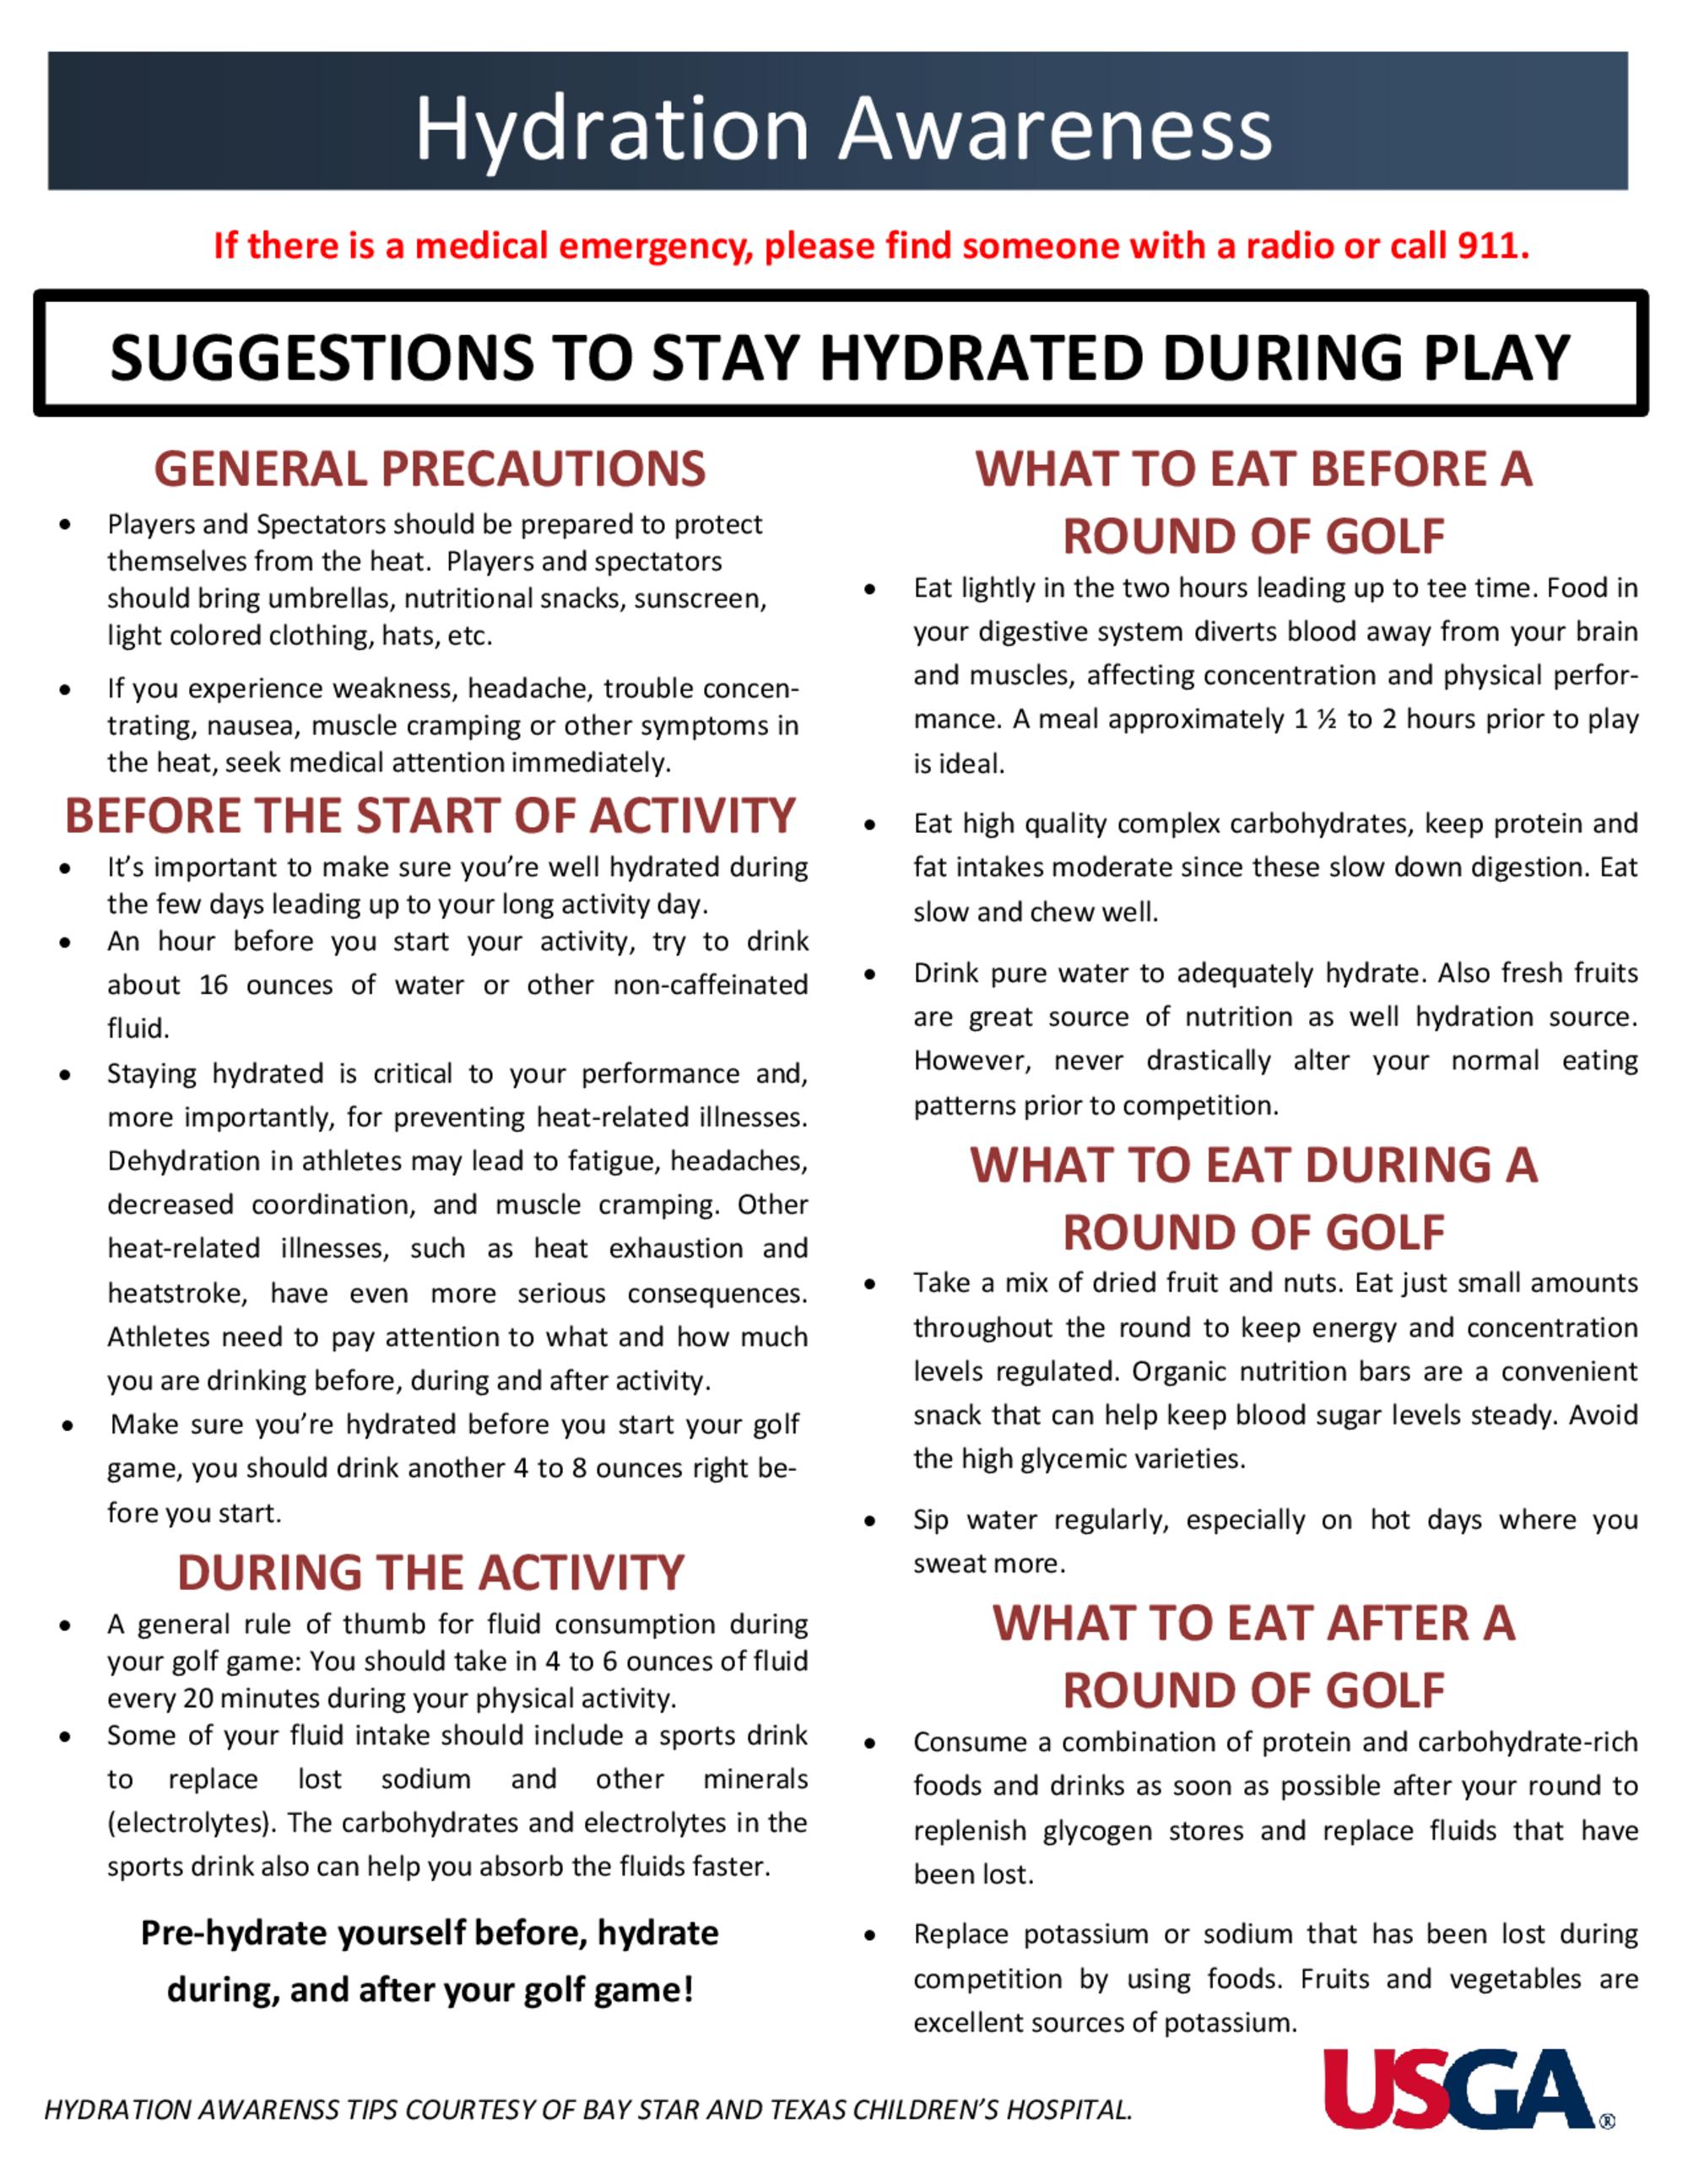 Hydration awareness flyer 1